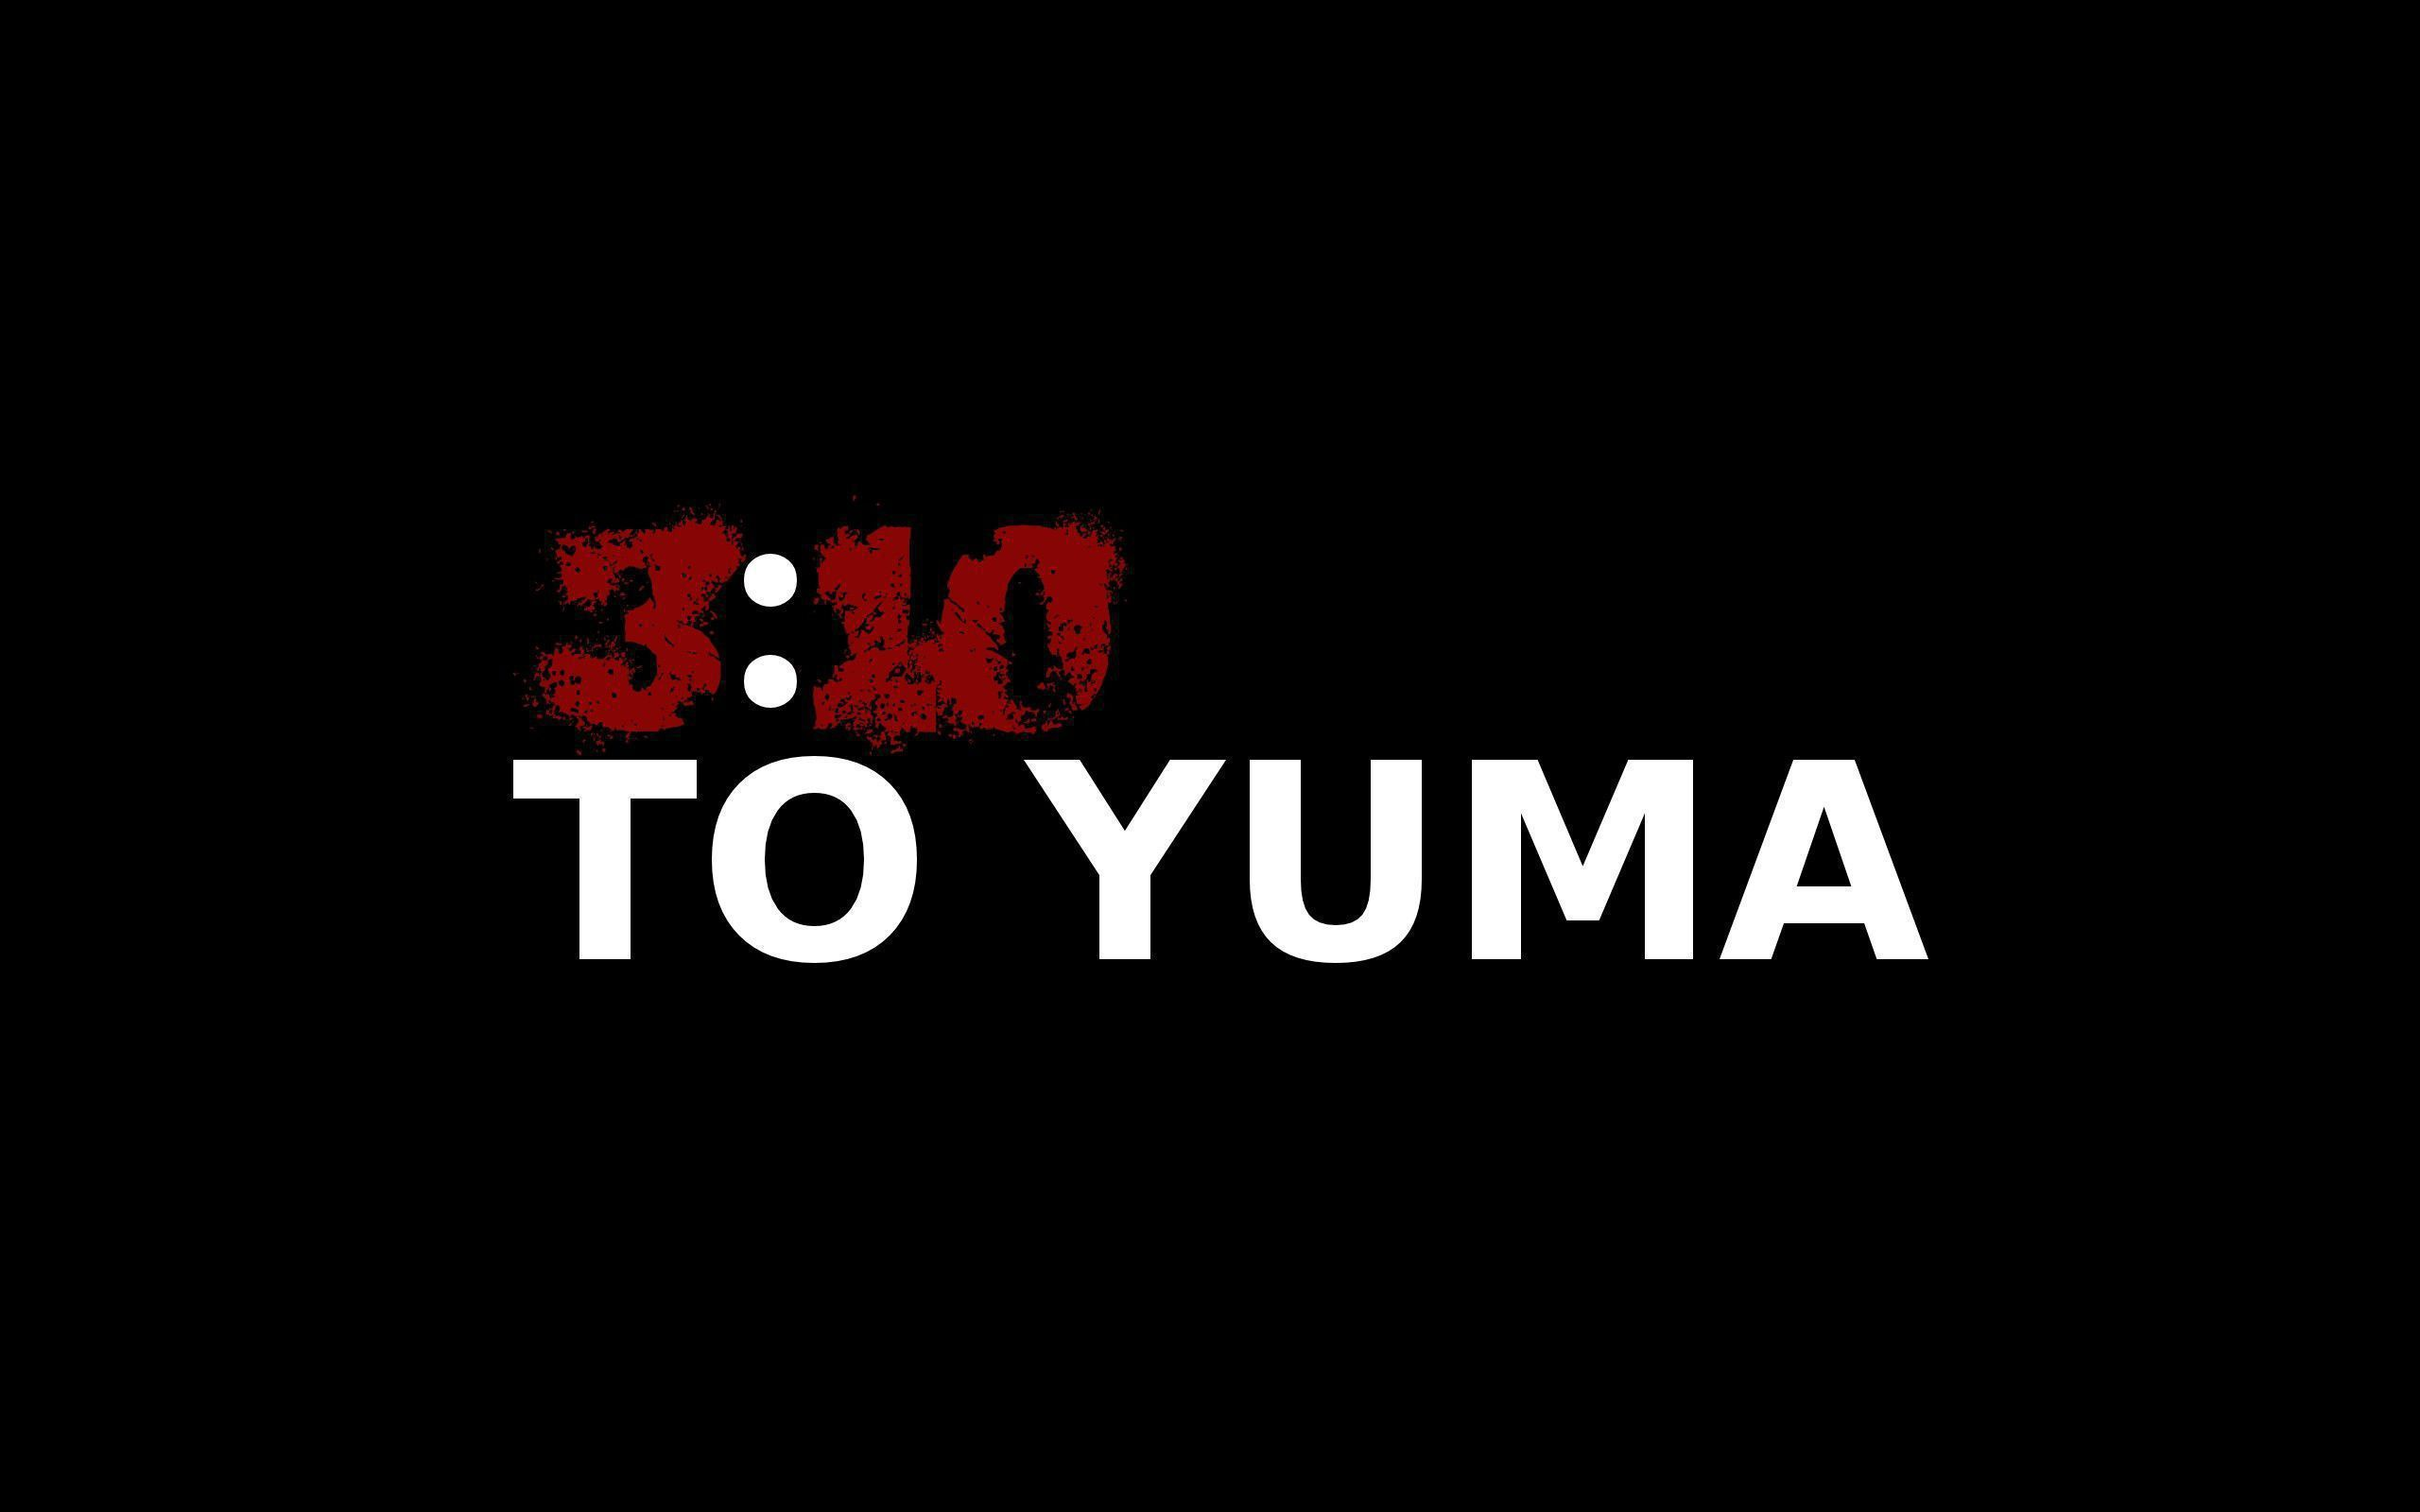 310 To Yuma Wallpapers HD